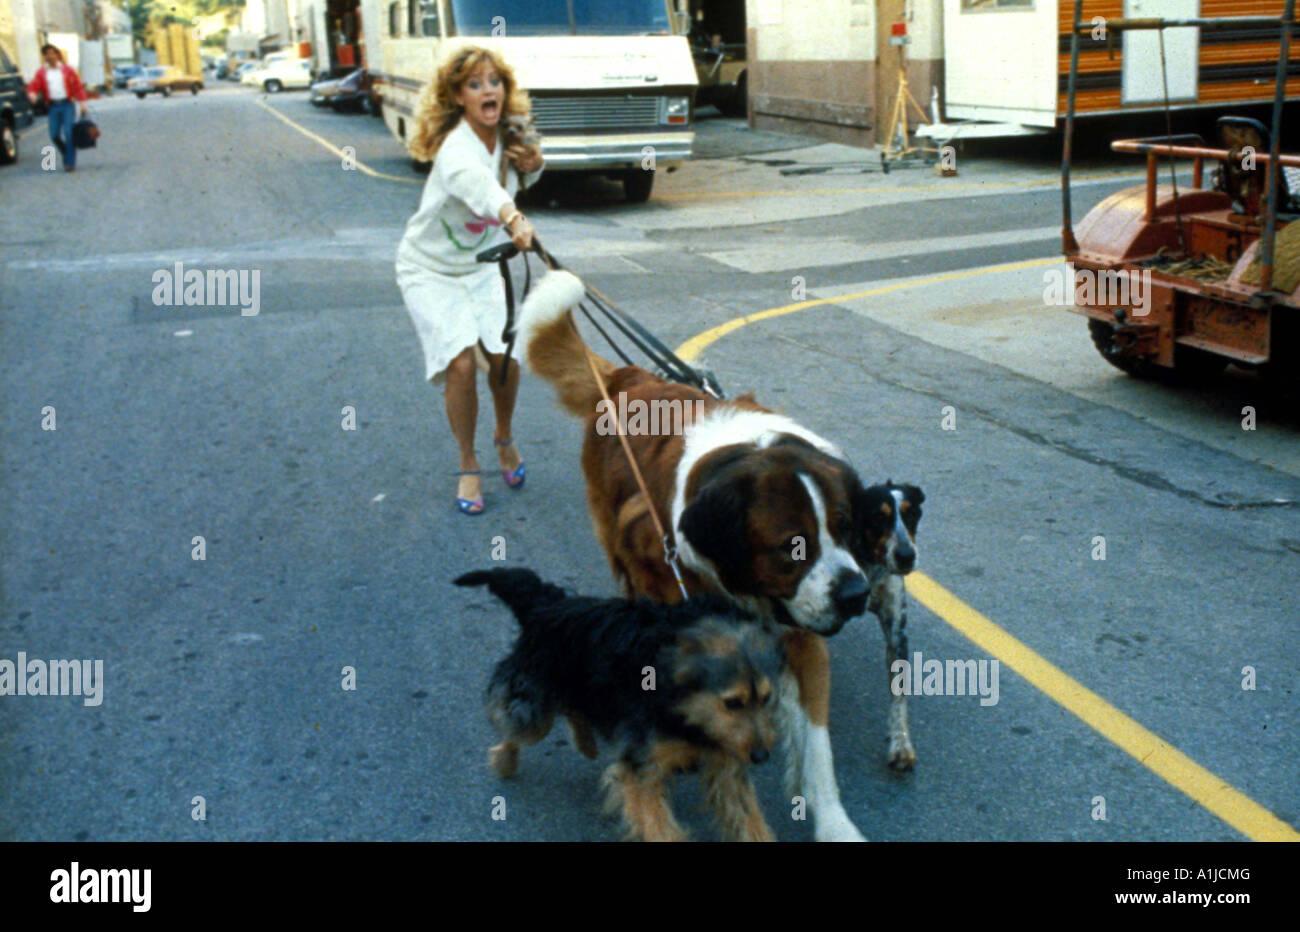 Goldie Hawn Director Stock Photos & Goldie Hawn Director Stock ...